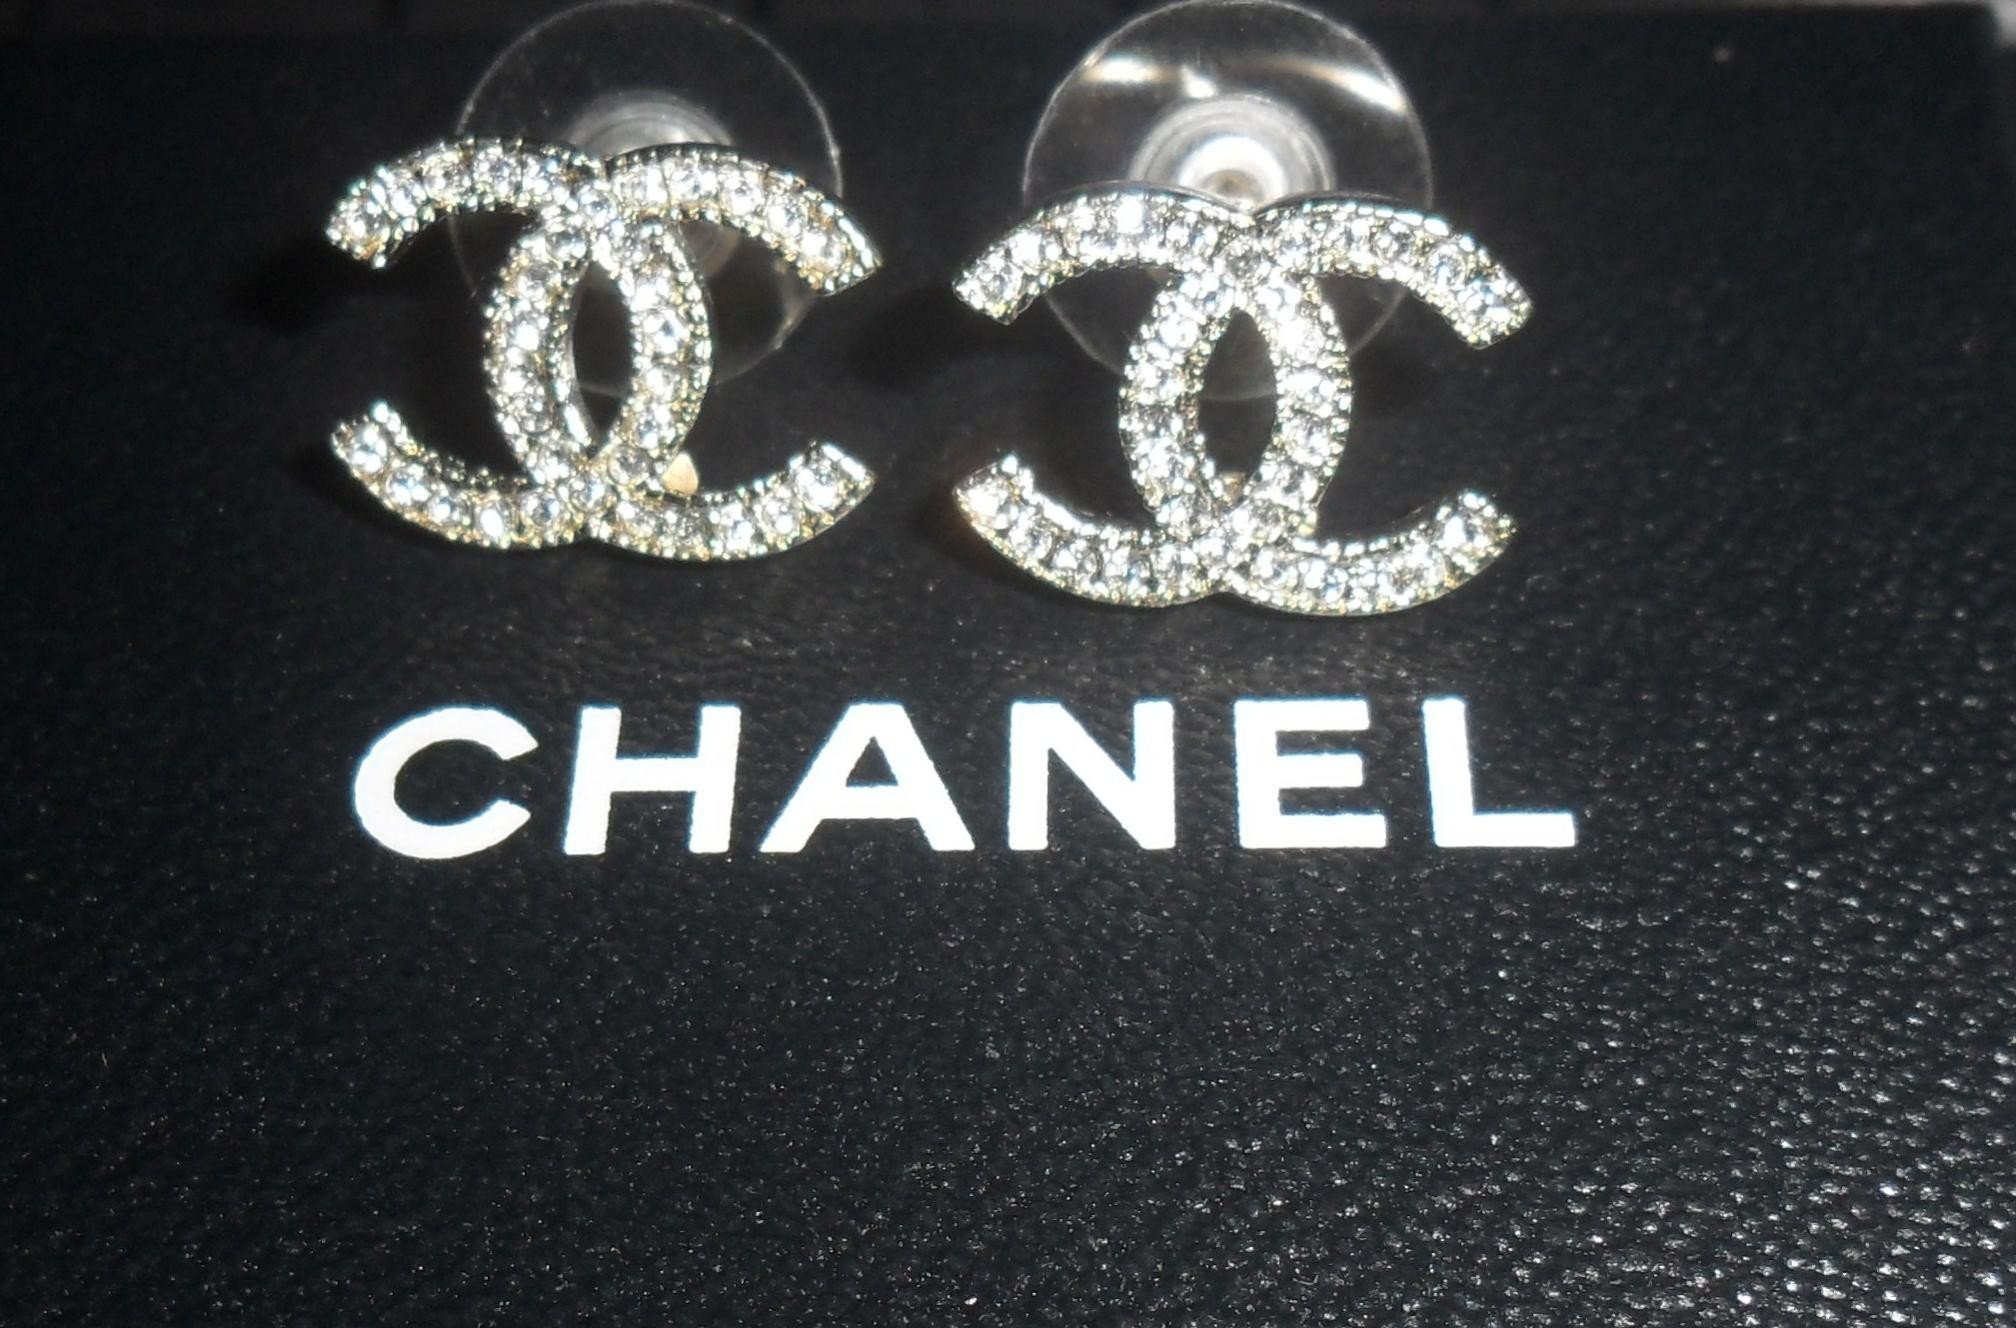 Chanel Logo Wallpaper 1